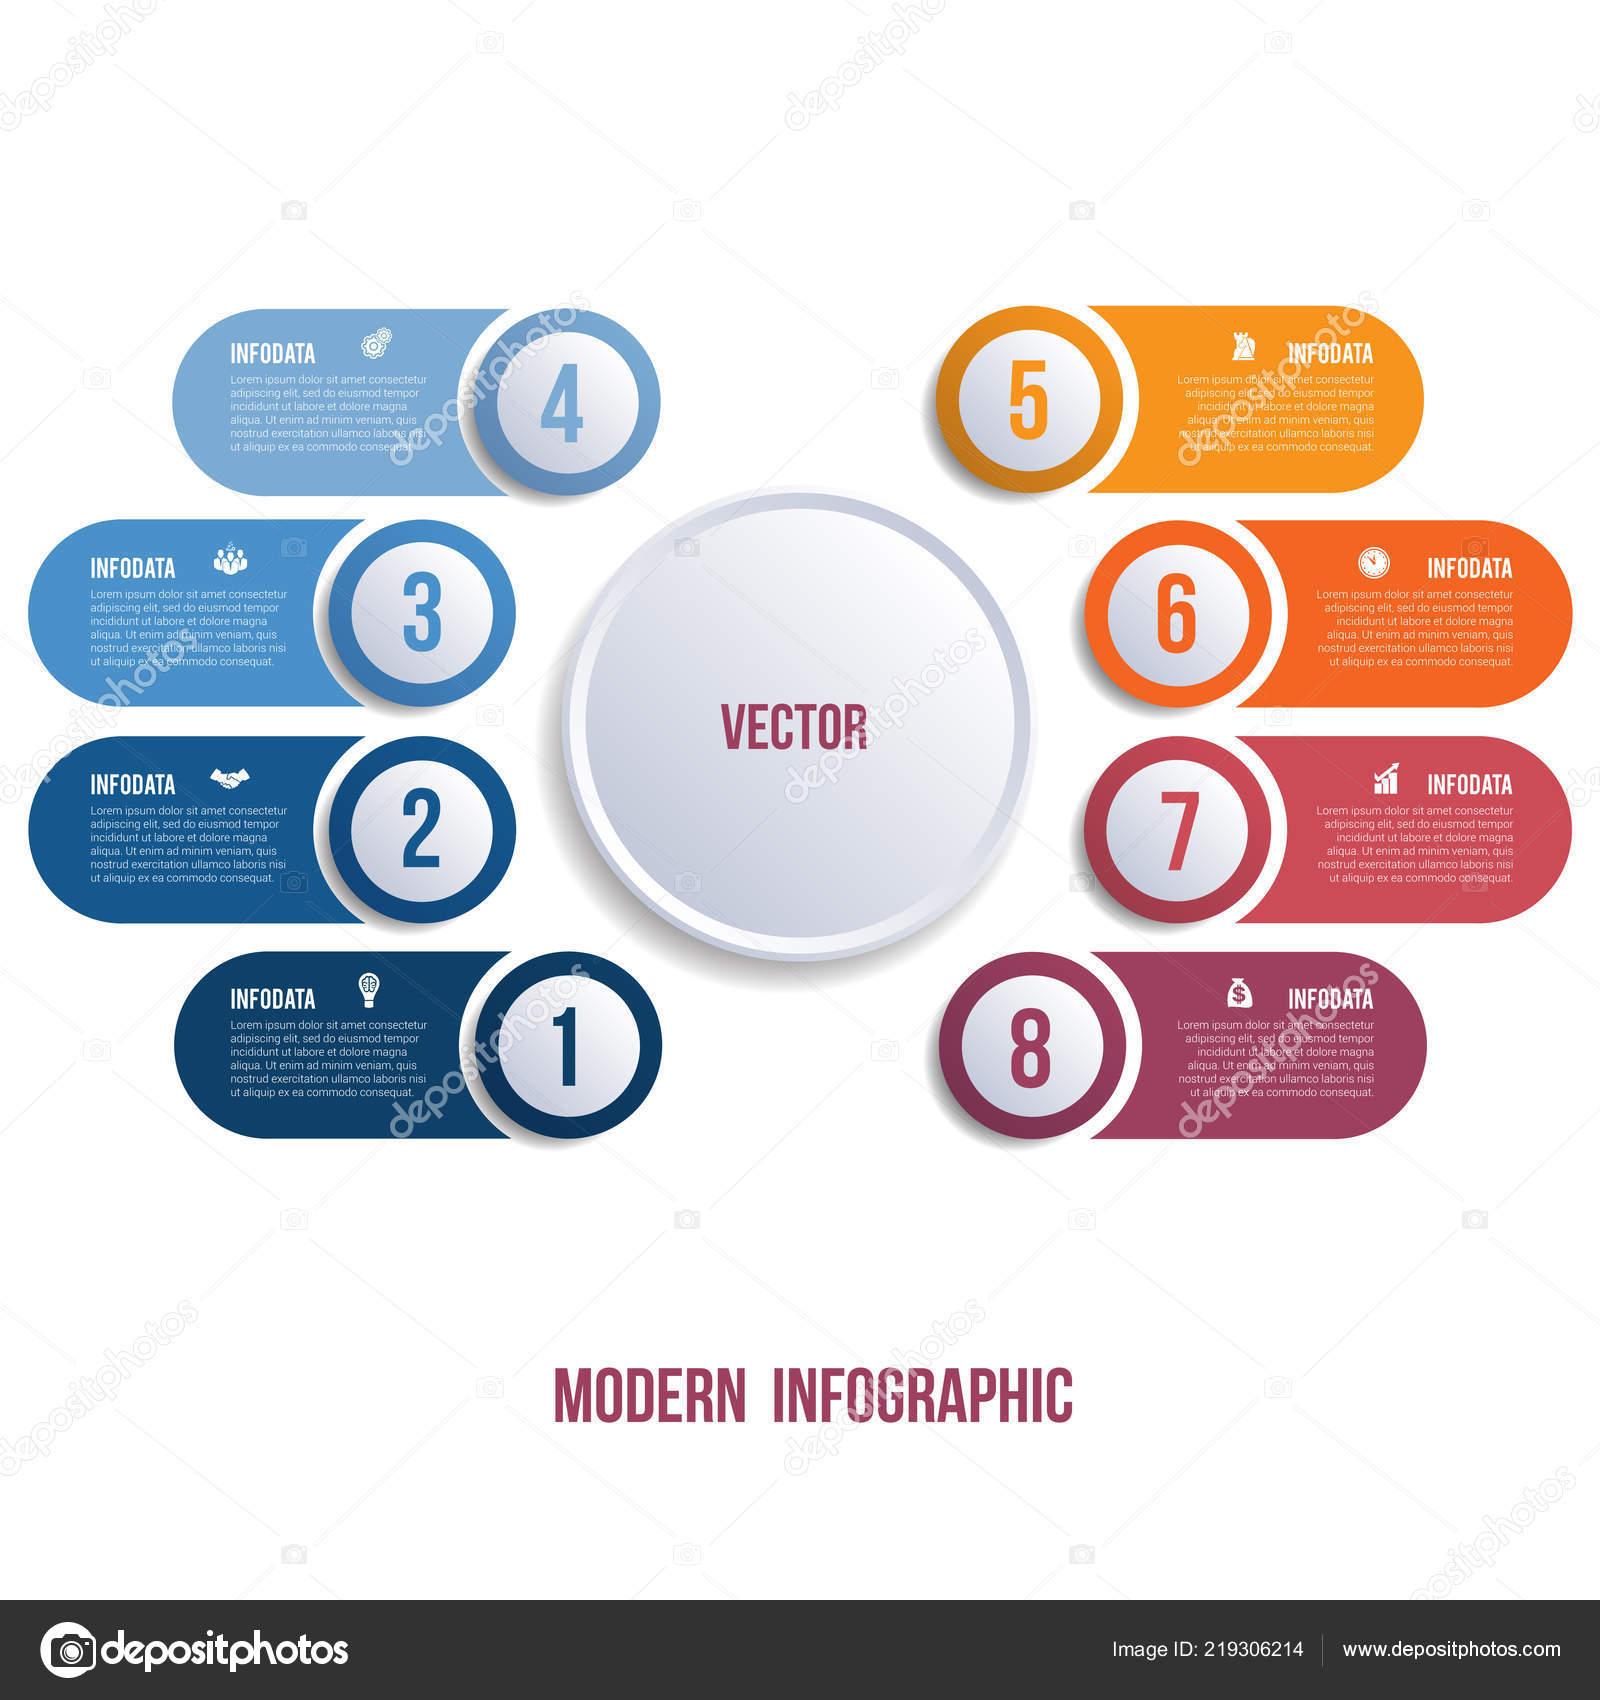 visualizaci u00f3n presentaciones negocio por infograf u00eda